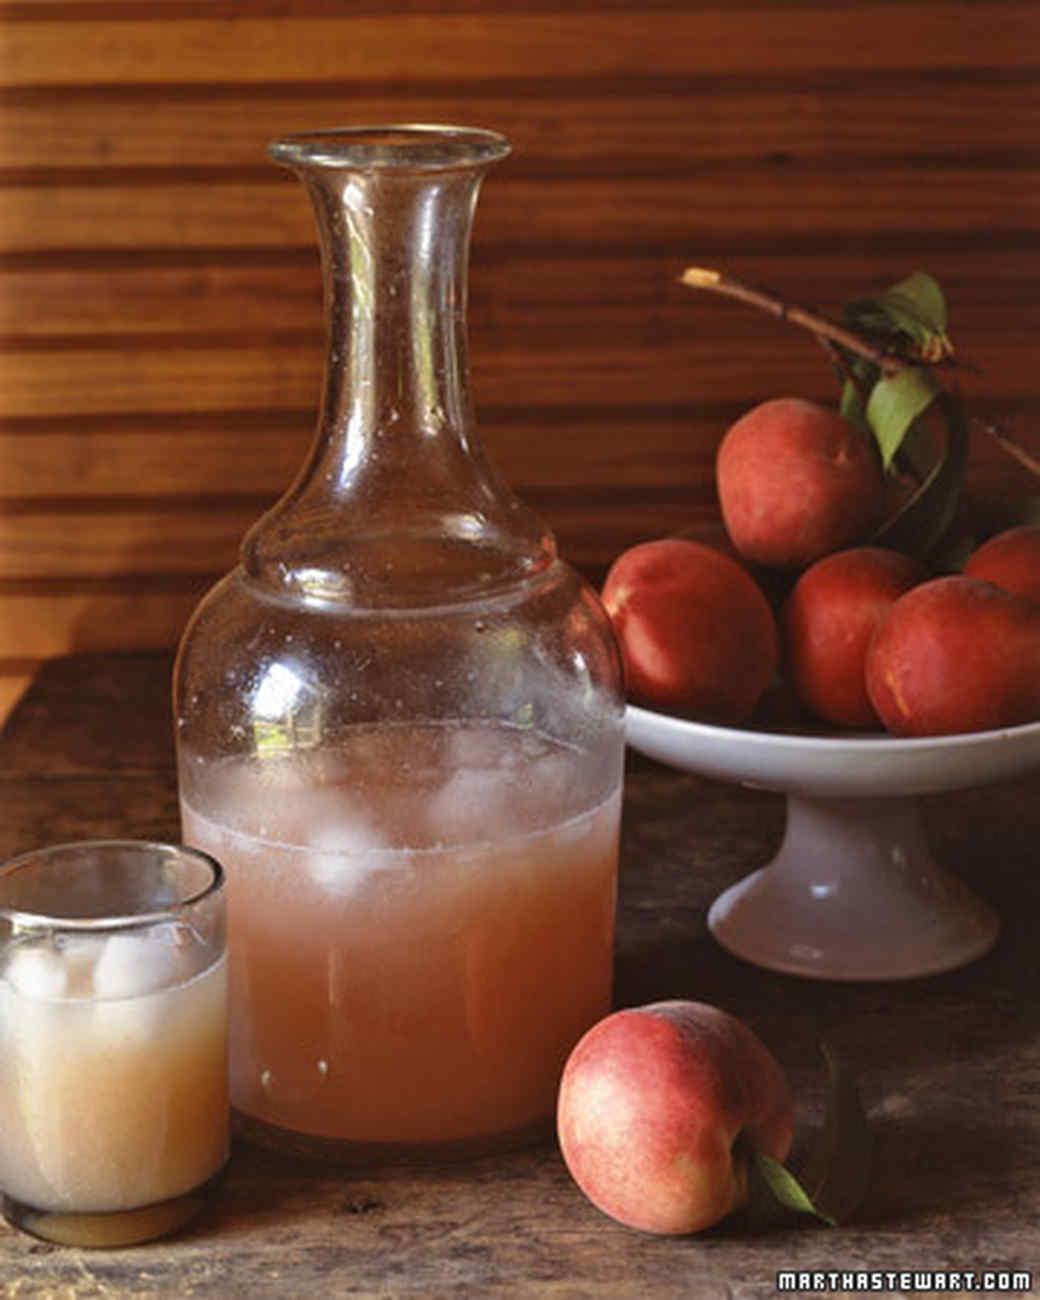 White Peach Juice